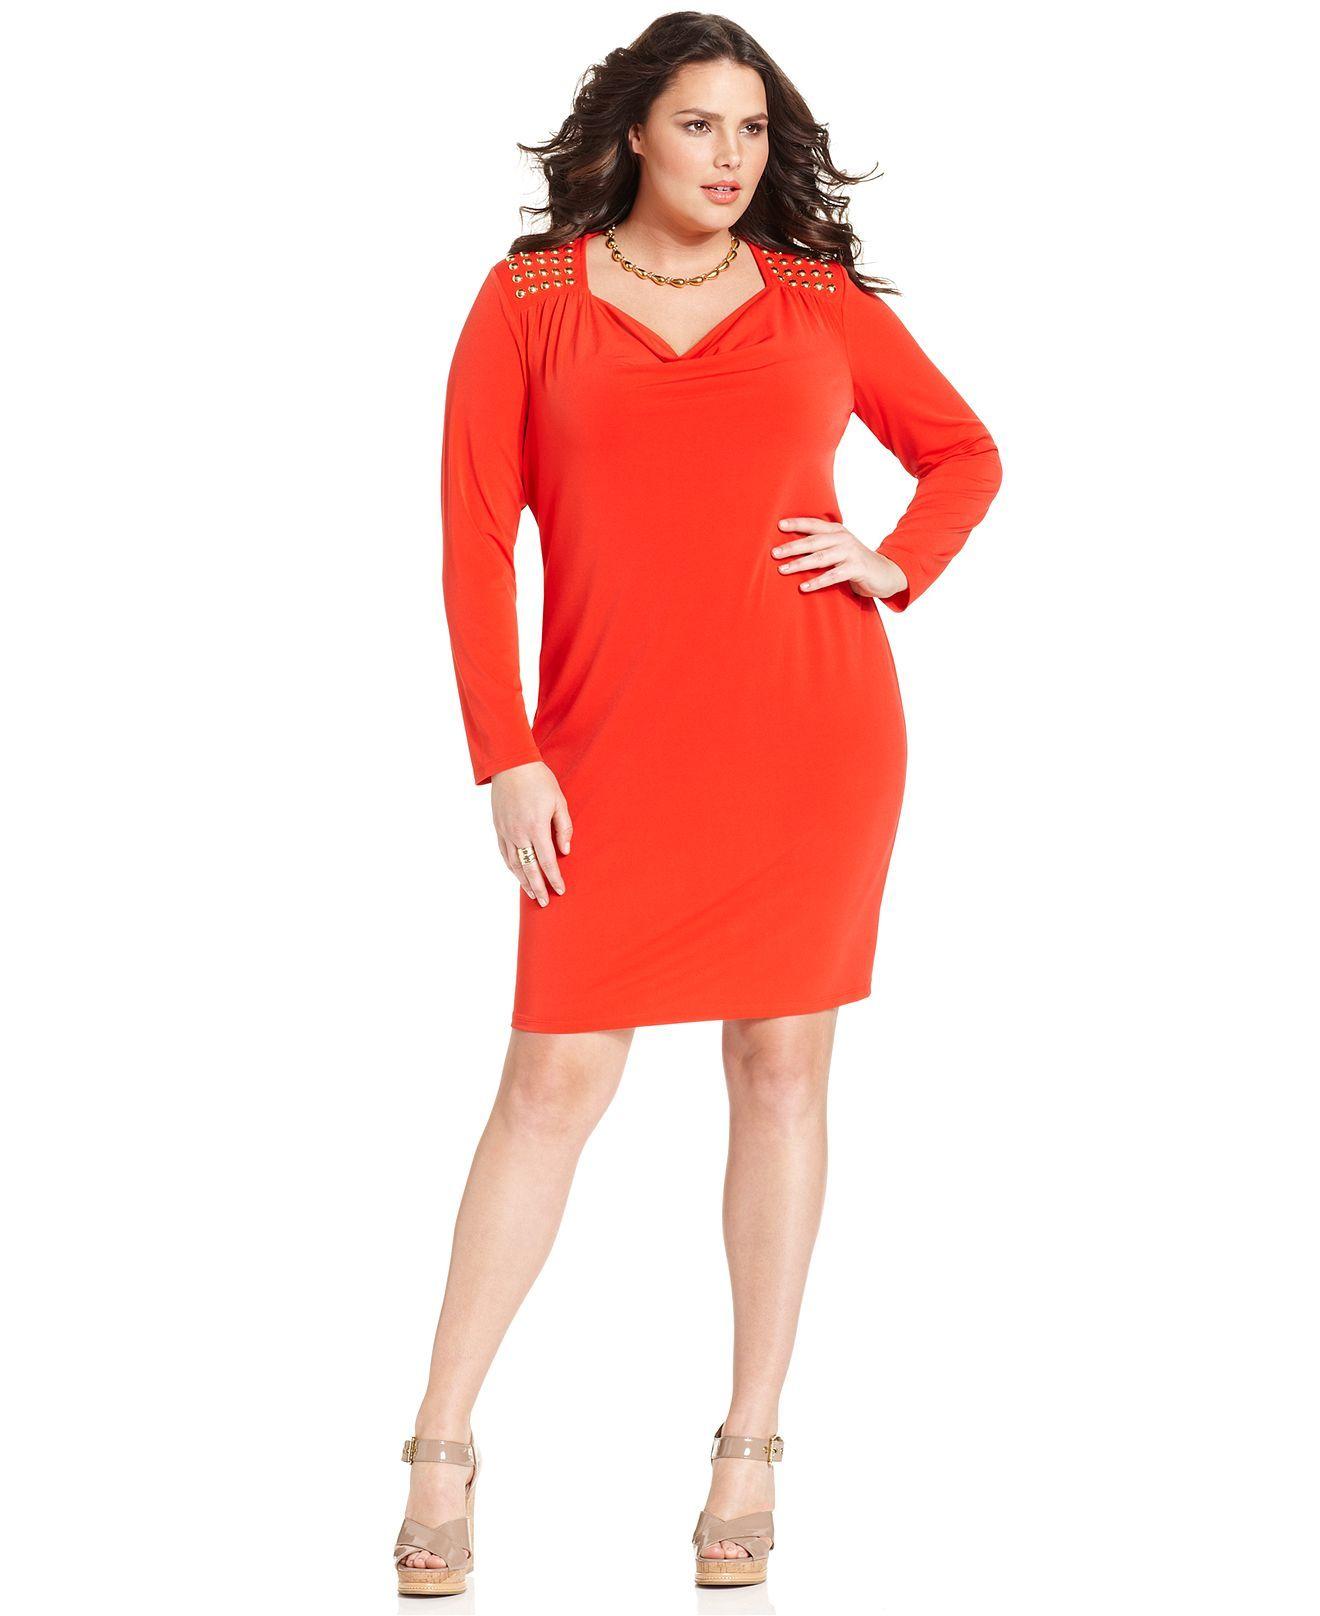 Michael Kors Plus Size Dresses At Macys